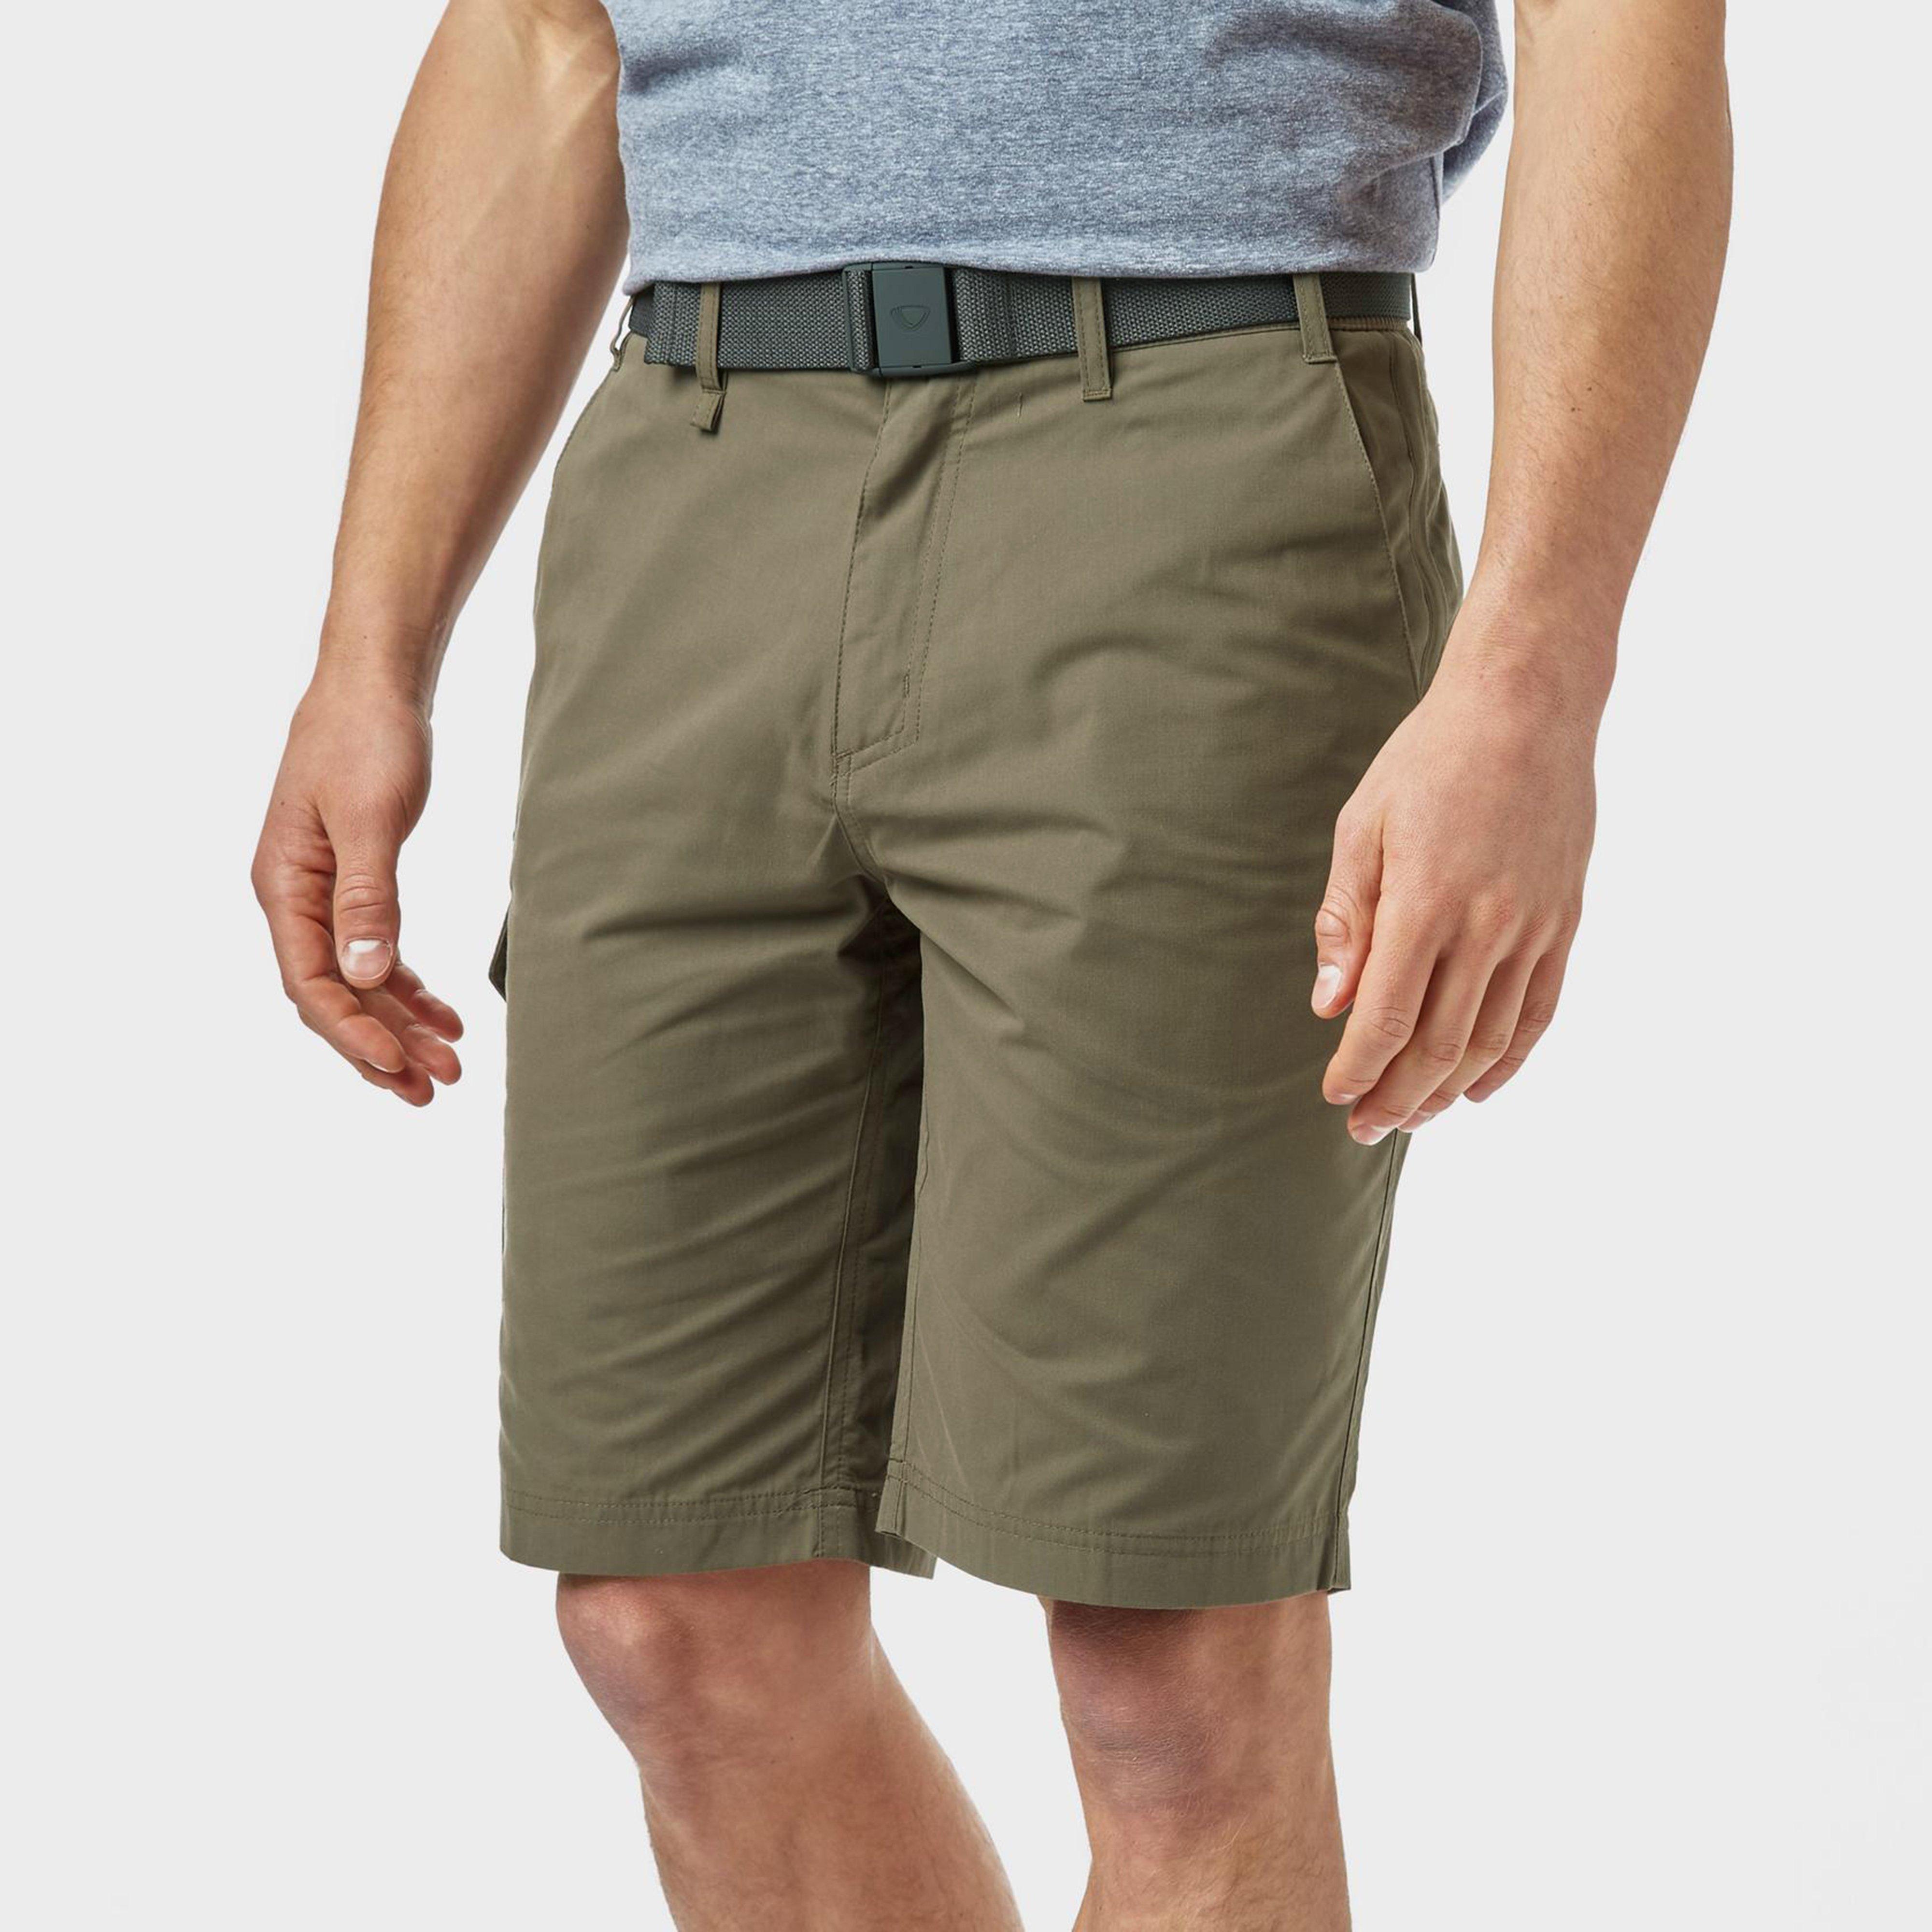 Brasher Men's Shorts, Brown/Brown